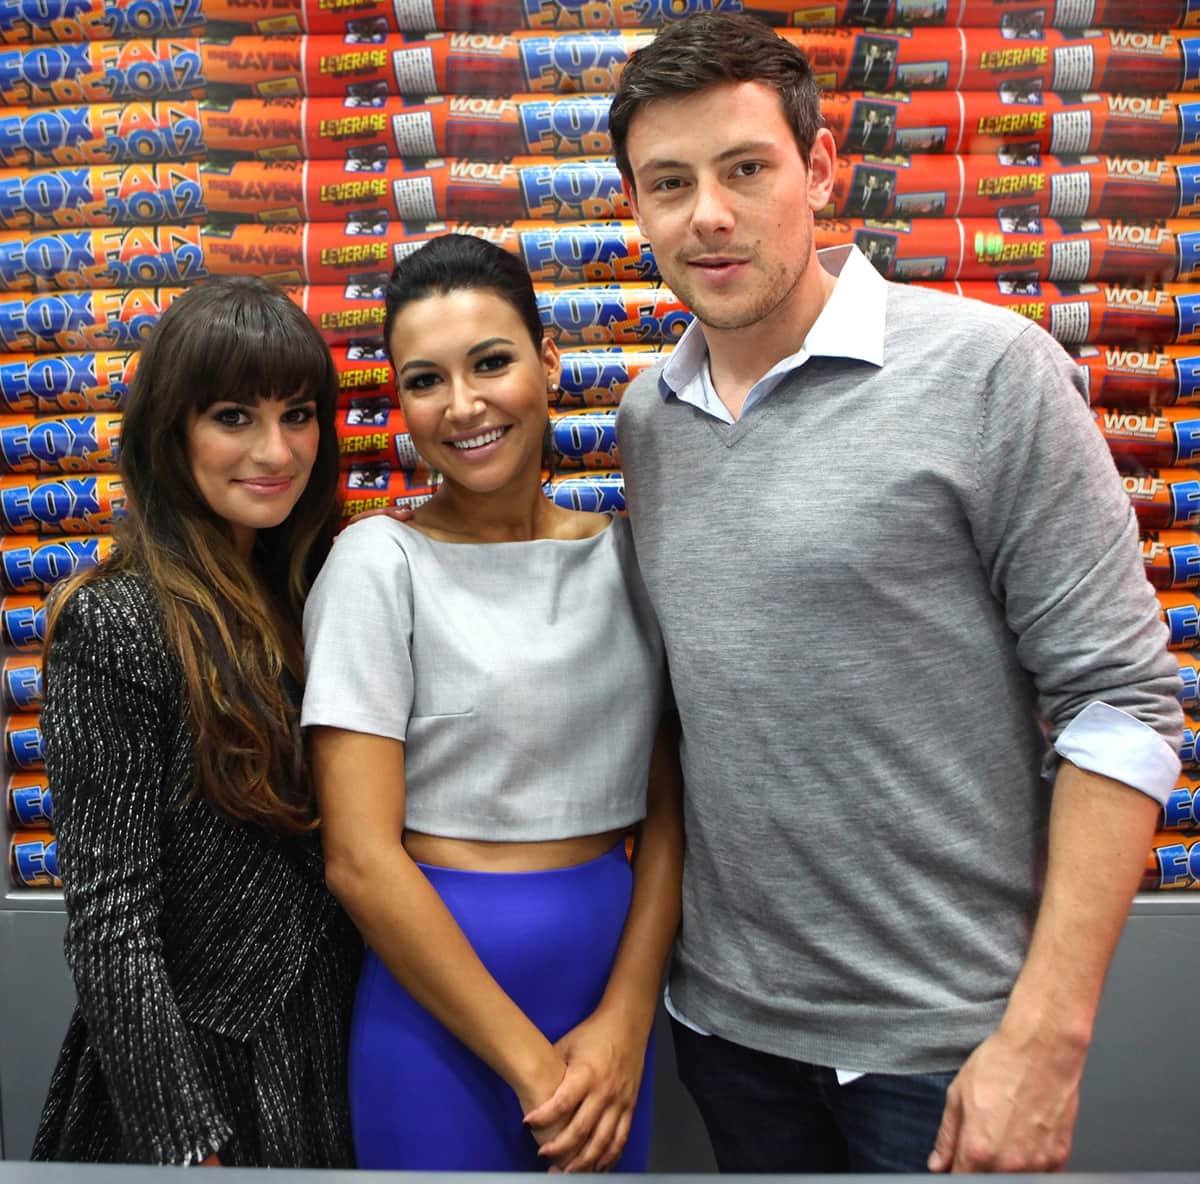 Lea Michele, Naya Rivera, Cory Monteith attend San Diego Comic-Con 2012